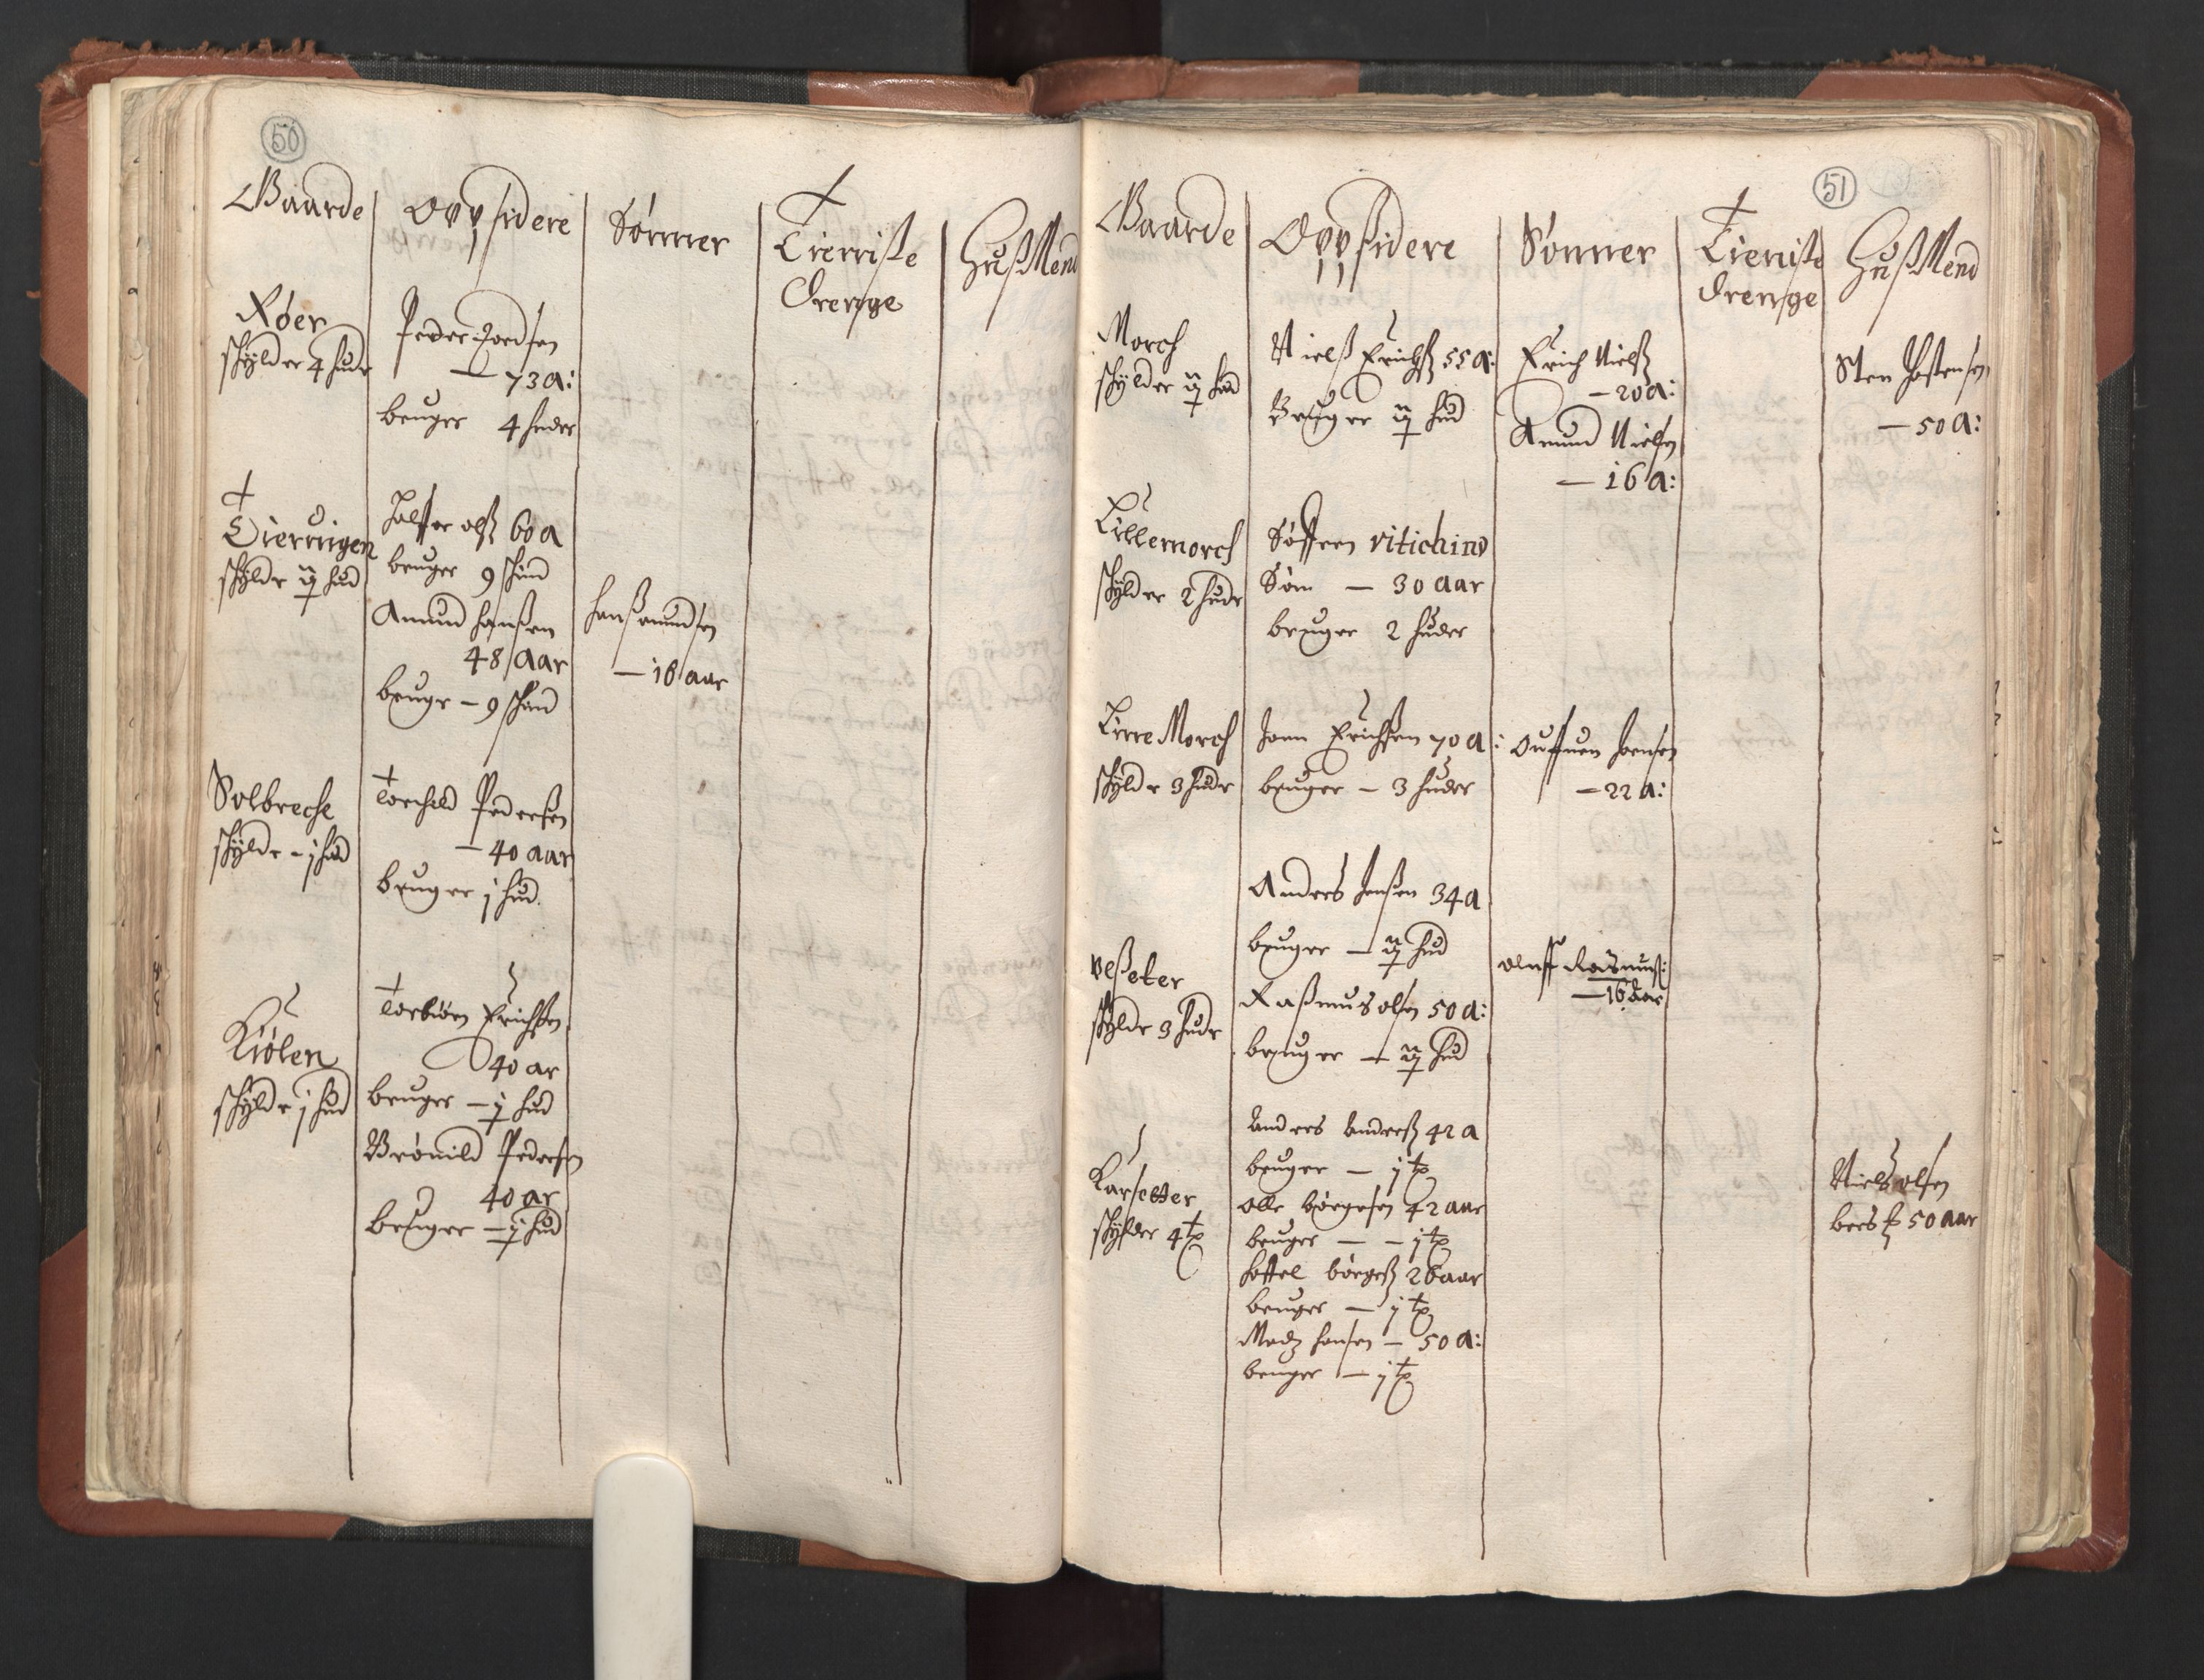 RA, Fogdenes og sorenskrivernes manntall 1664-1666, nr. 1: Fogderier (len og skipreider) i nåværende Østfold fylke, 1664, s. 50-51